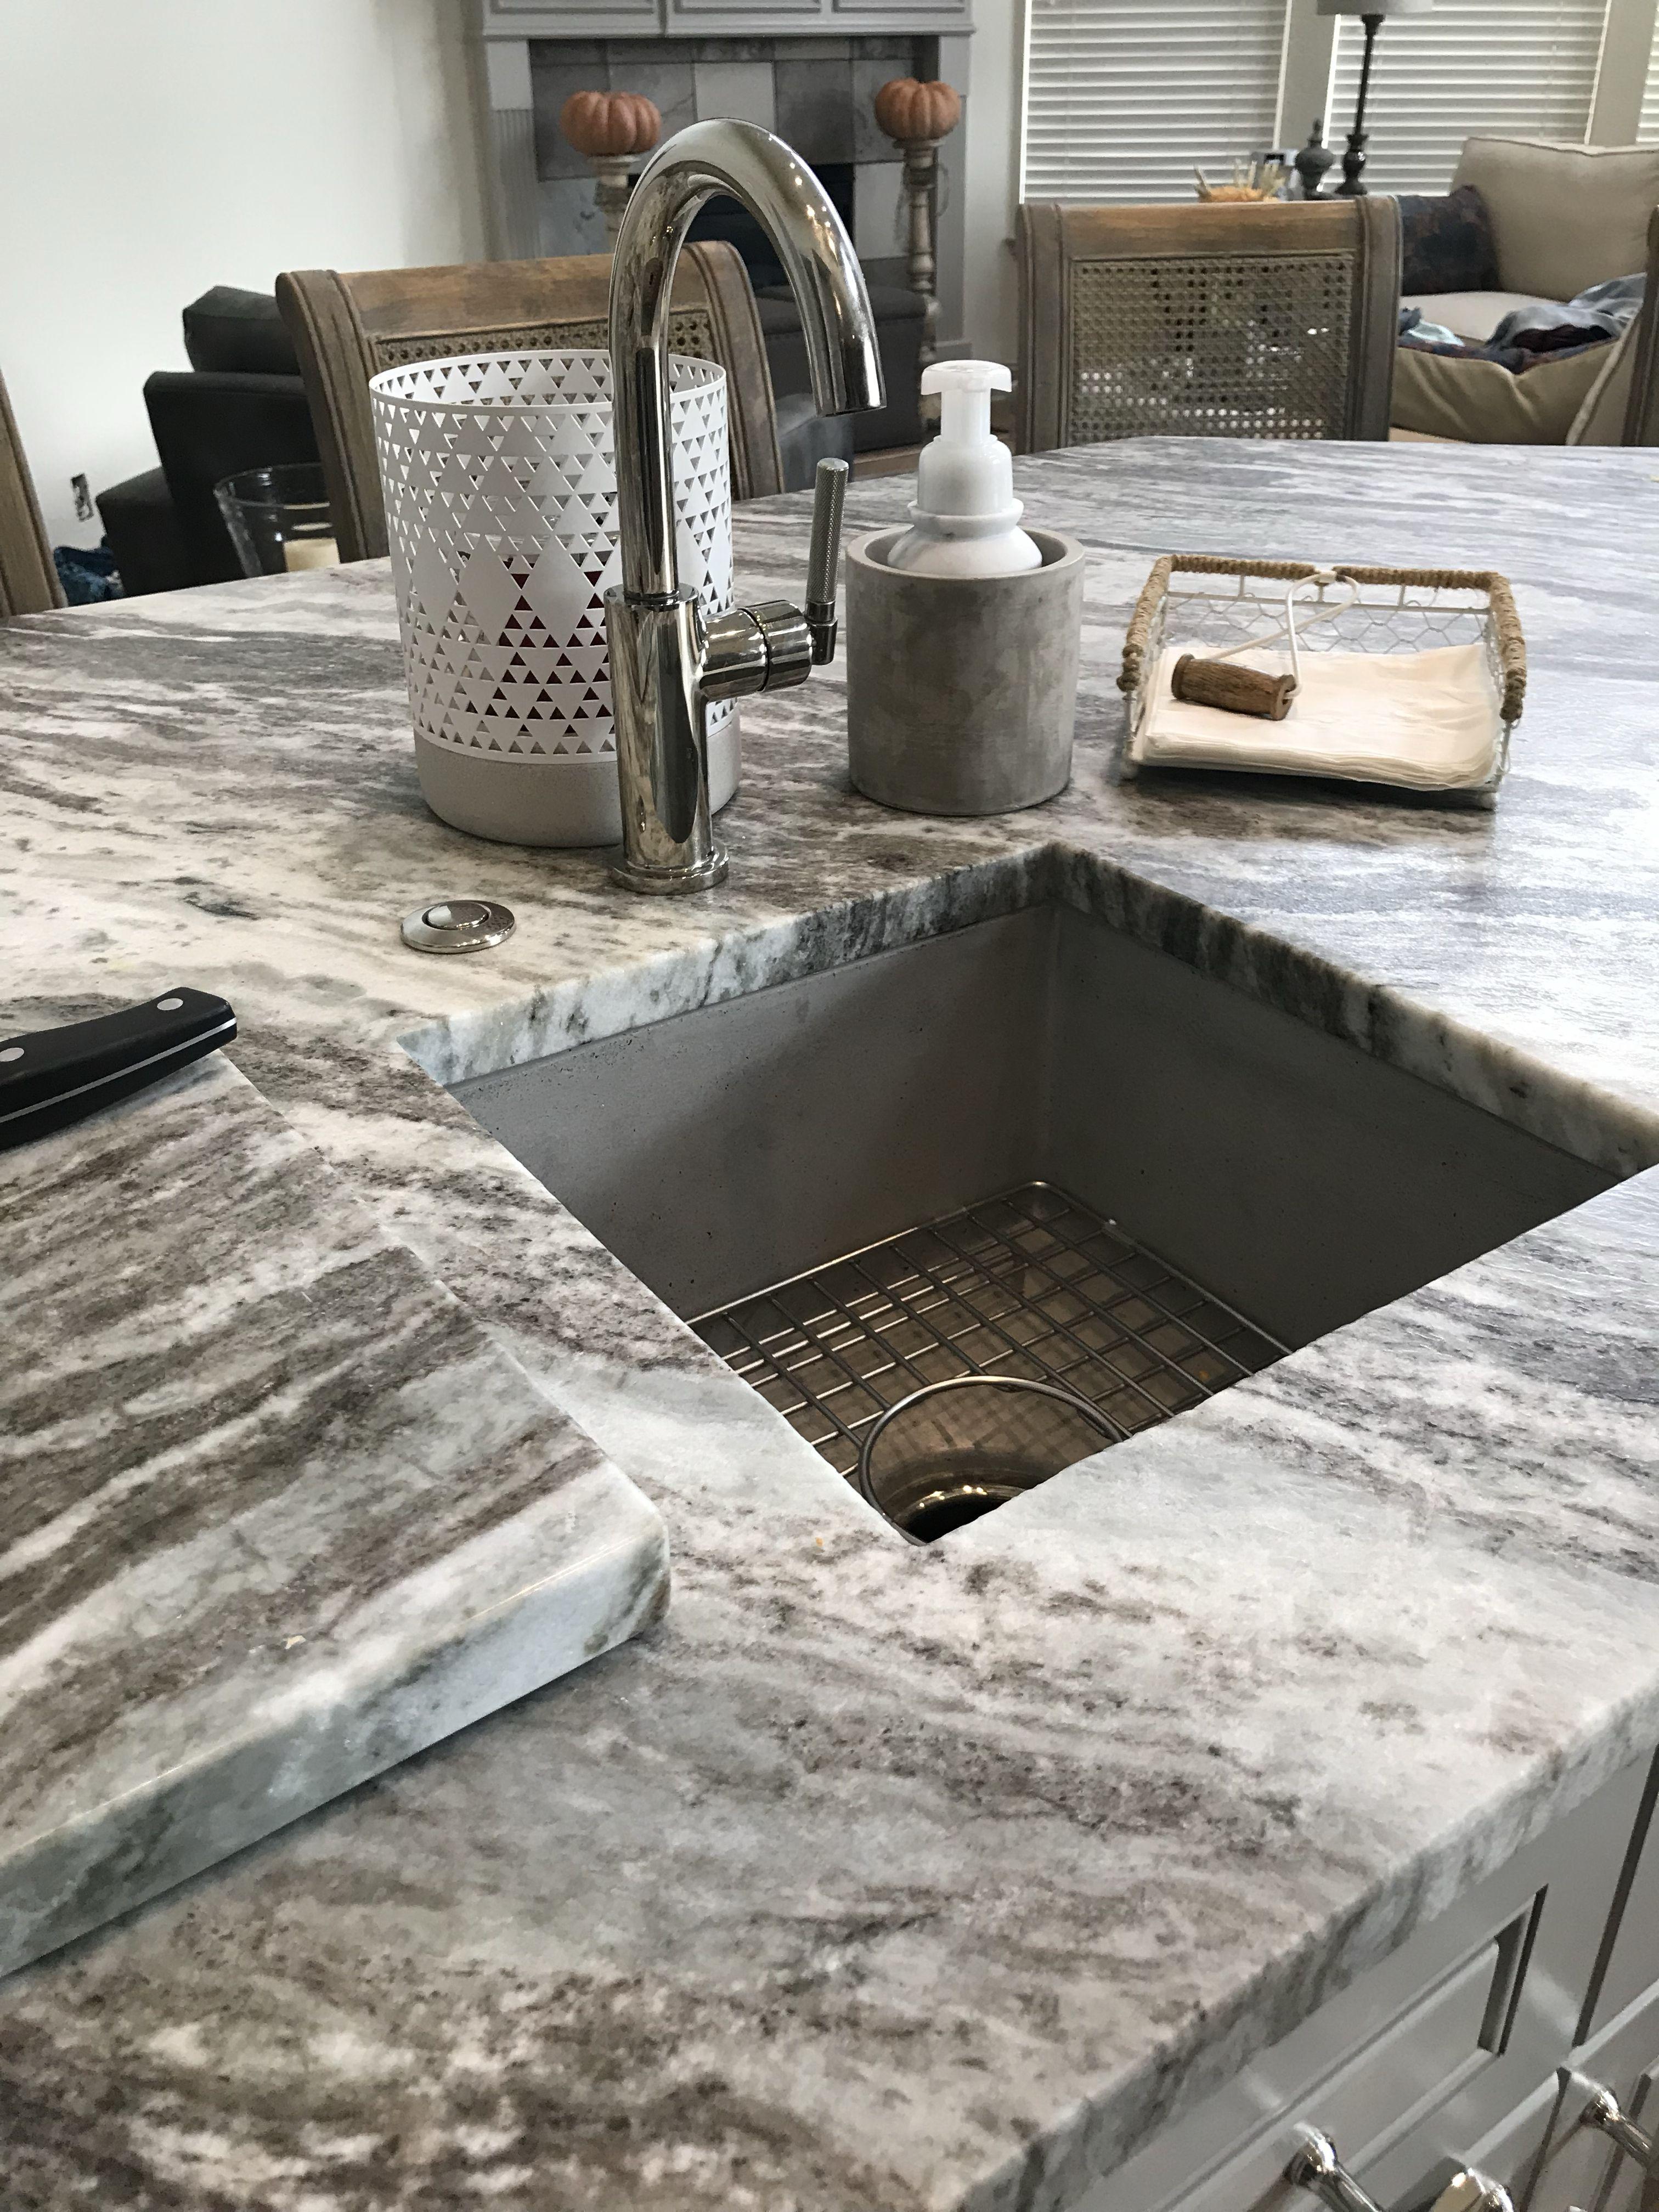 Fantasy Brown Granite Fantasy Brown Granite Kitchen Remodel Inspiration Fantasy Brown